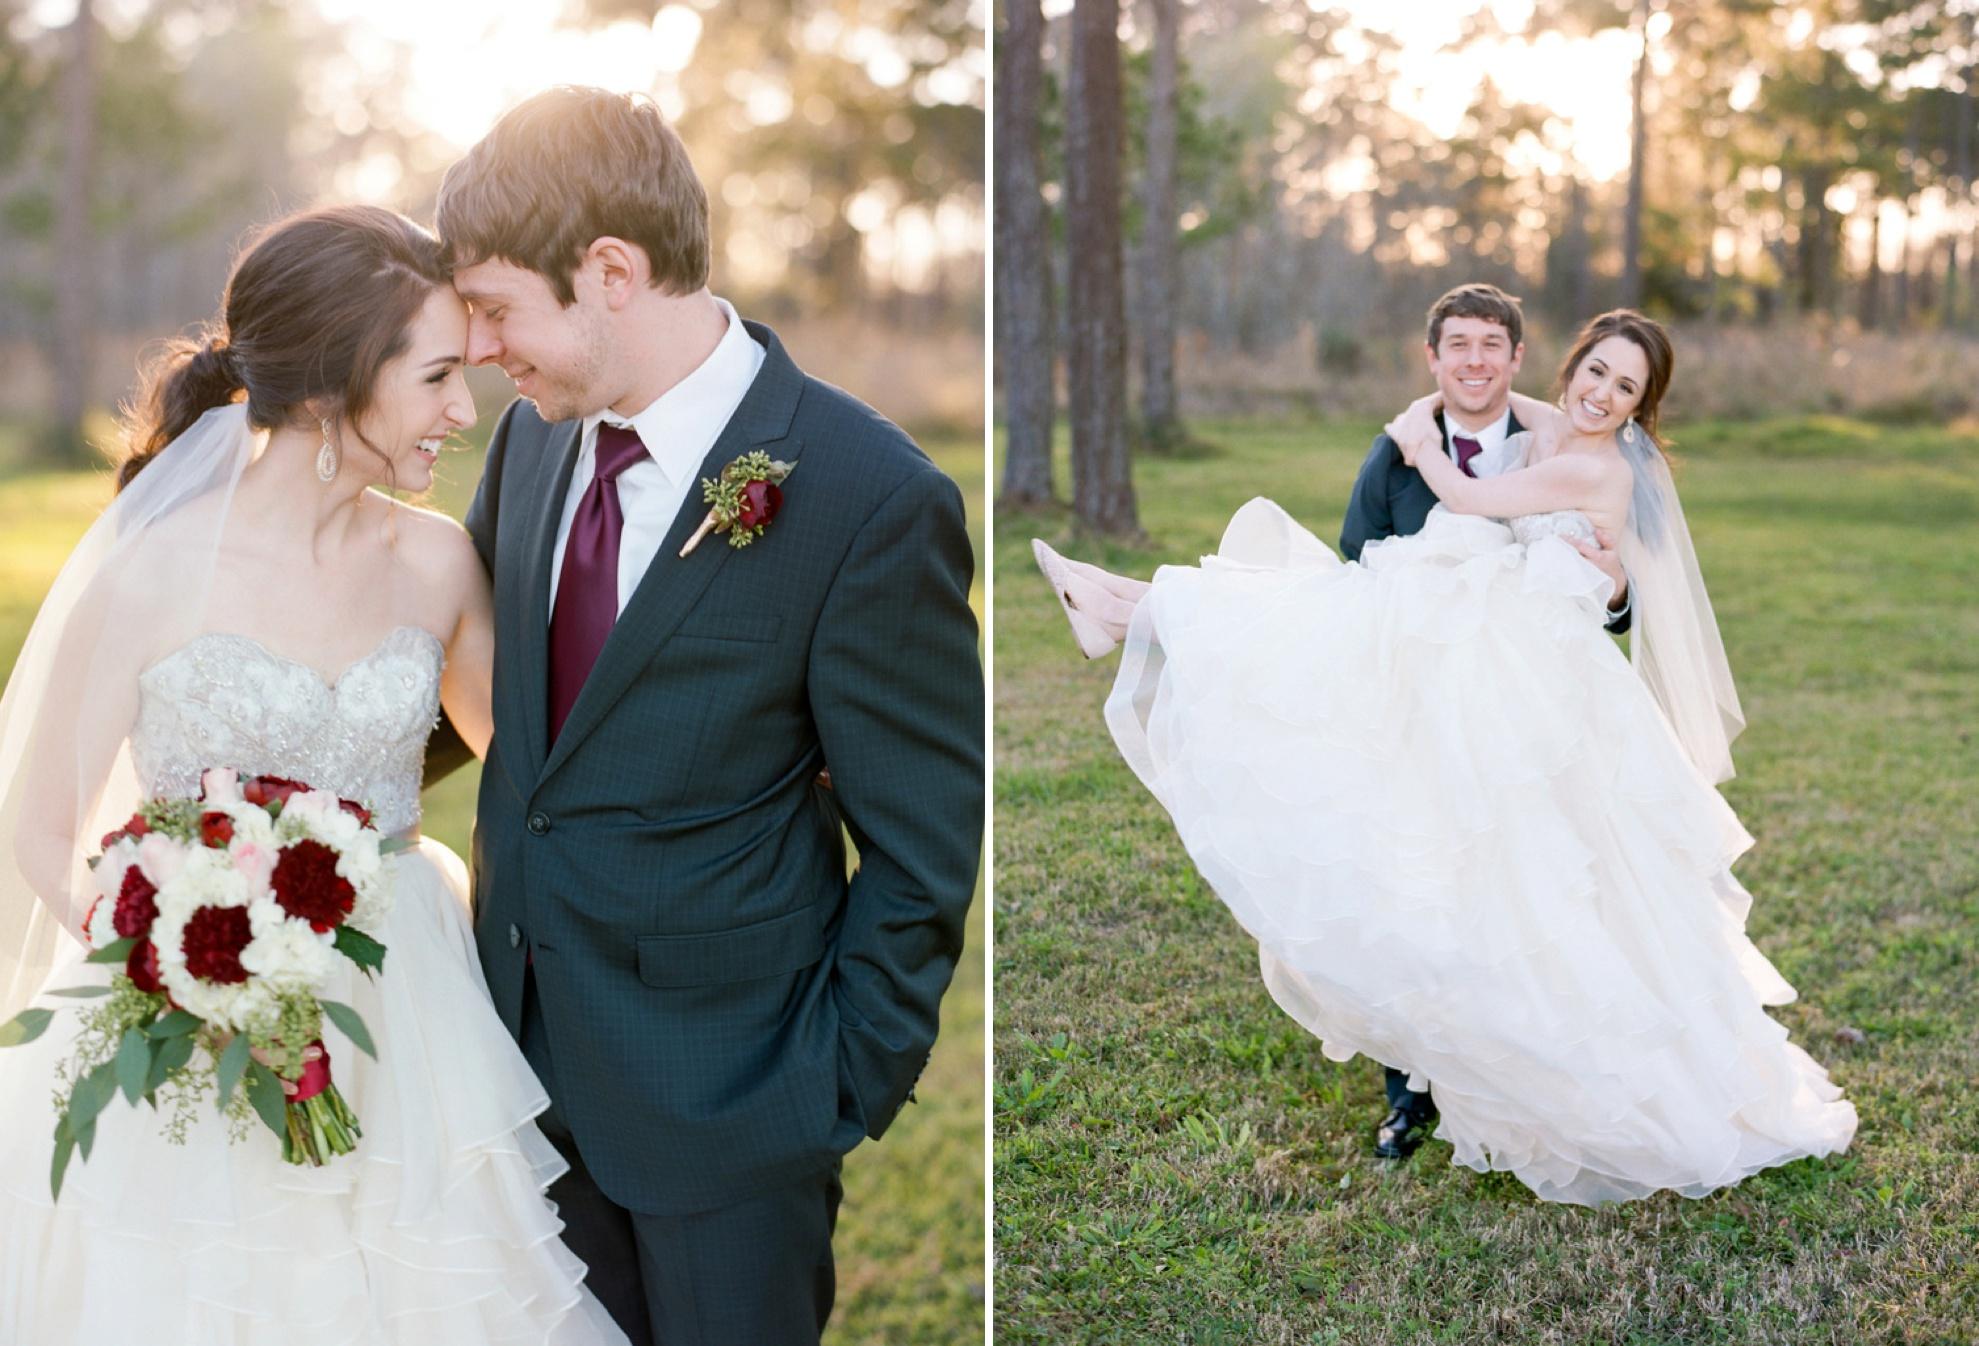 Tuscan-Courtyard-Wedding-Venue-Texas-City-Ceremony-Reception-Photographer-Dana-Fernandez-Photography-1.jpg